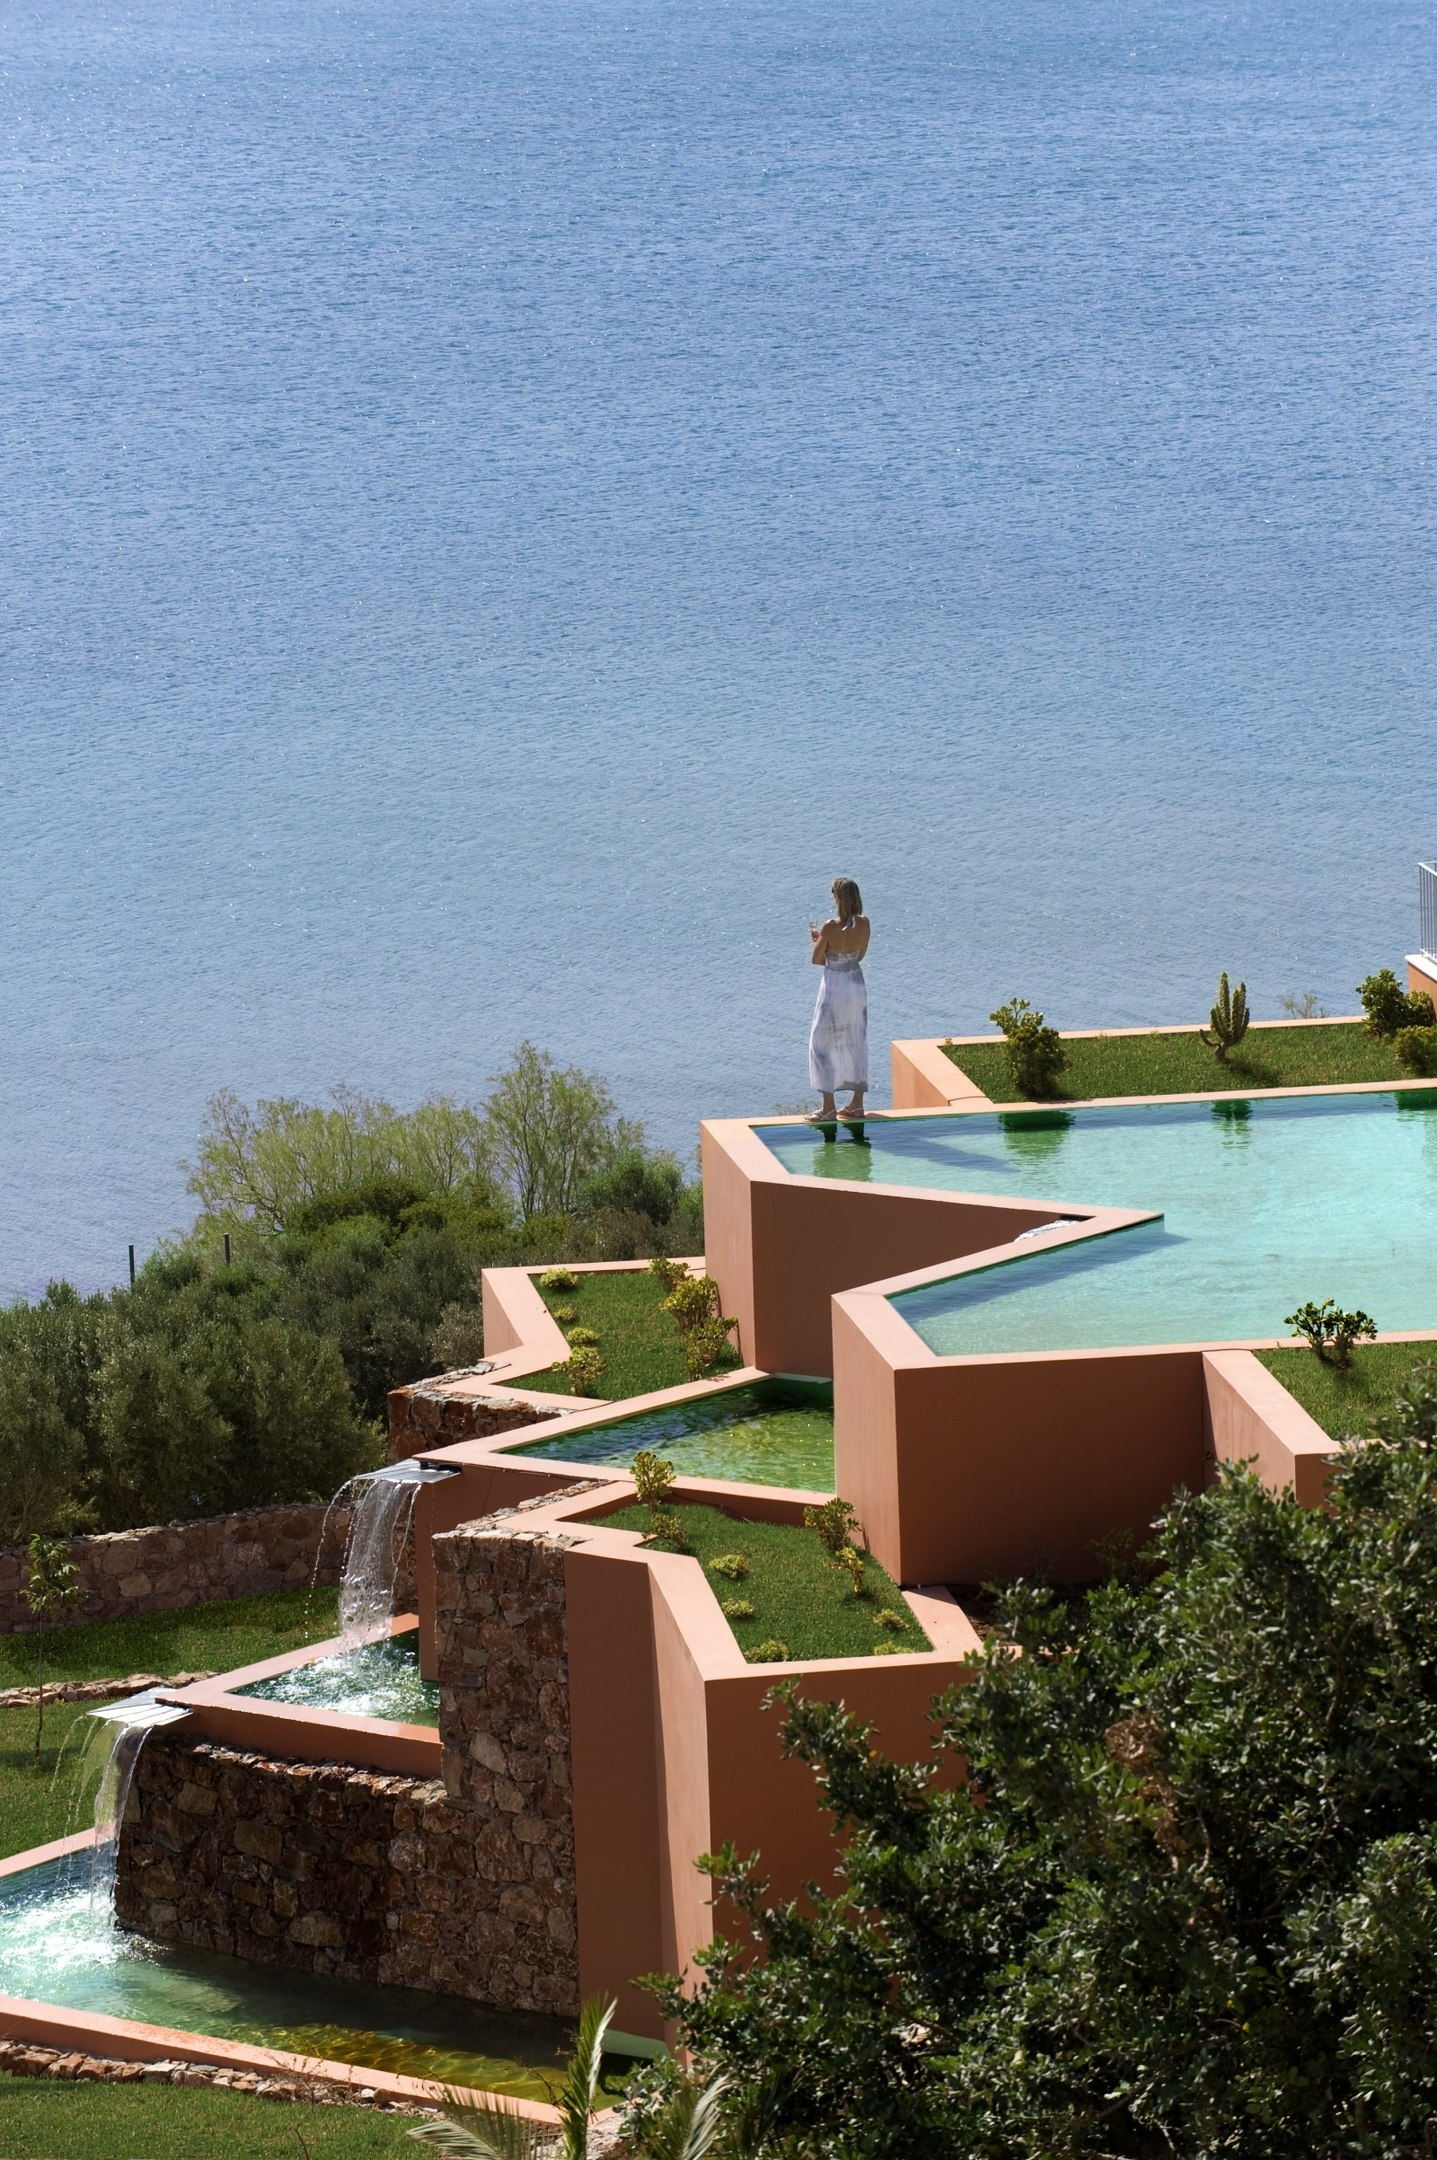 Лучшие отели мира от Soul Travel The Domes of Elounda (Греция), изображение №2